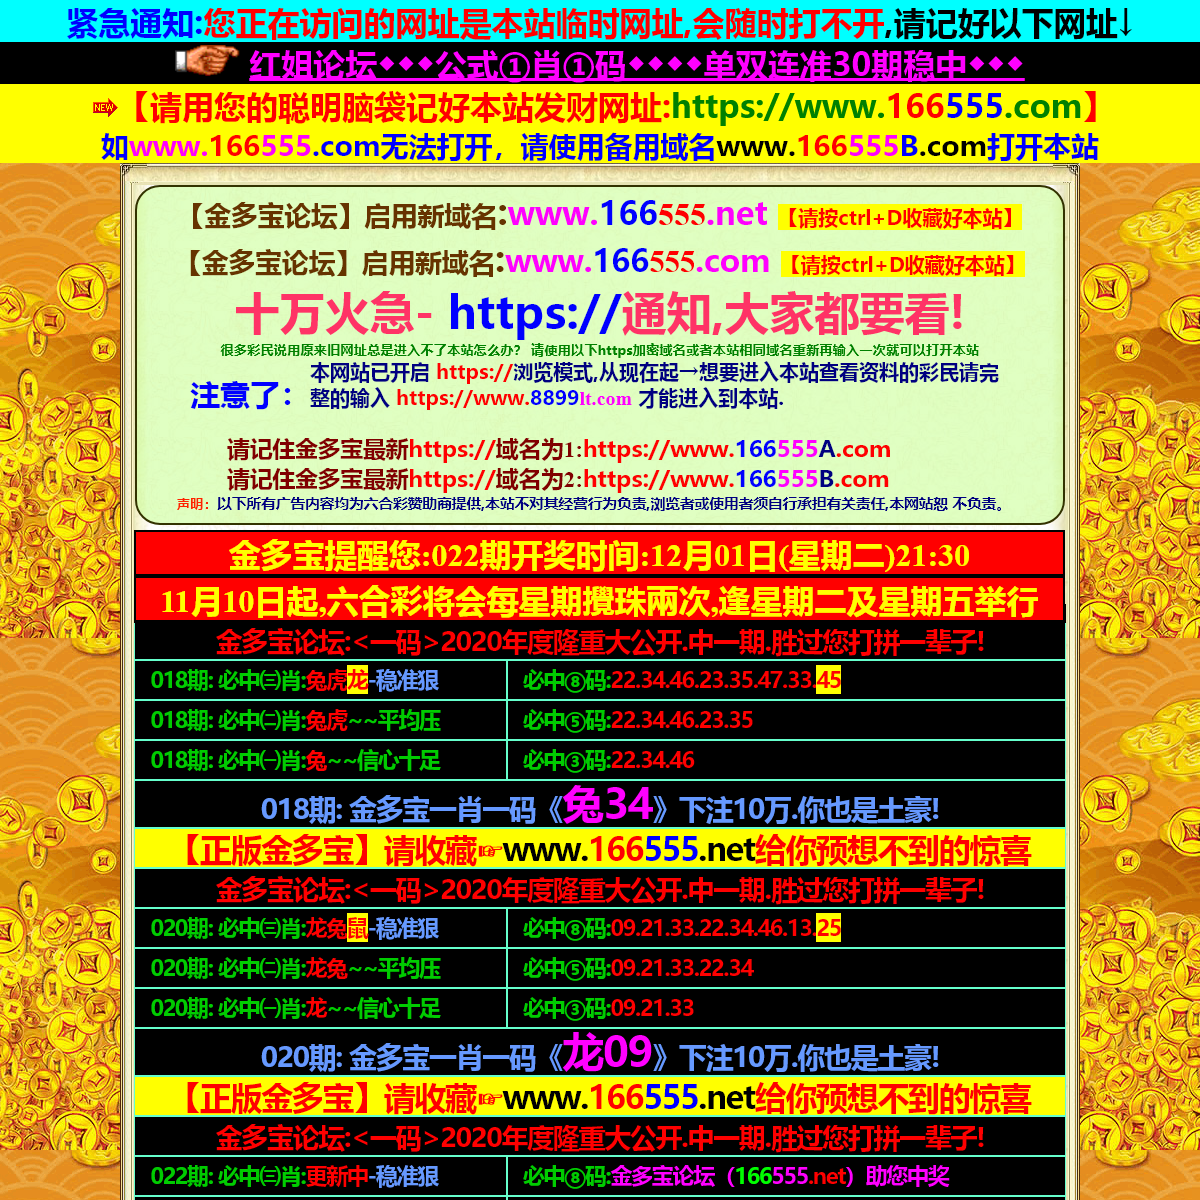 www.57418.com,香港赛马会,www.64007.com,www.59765.com,www.31441.com,六合开奖结果